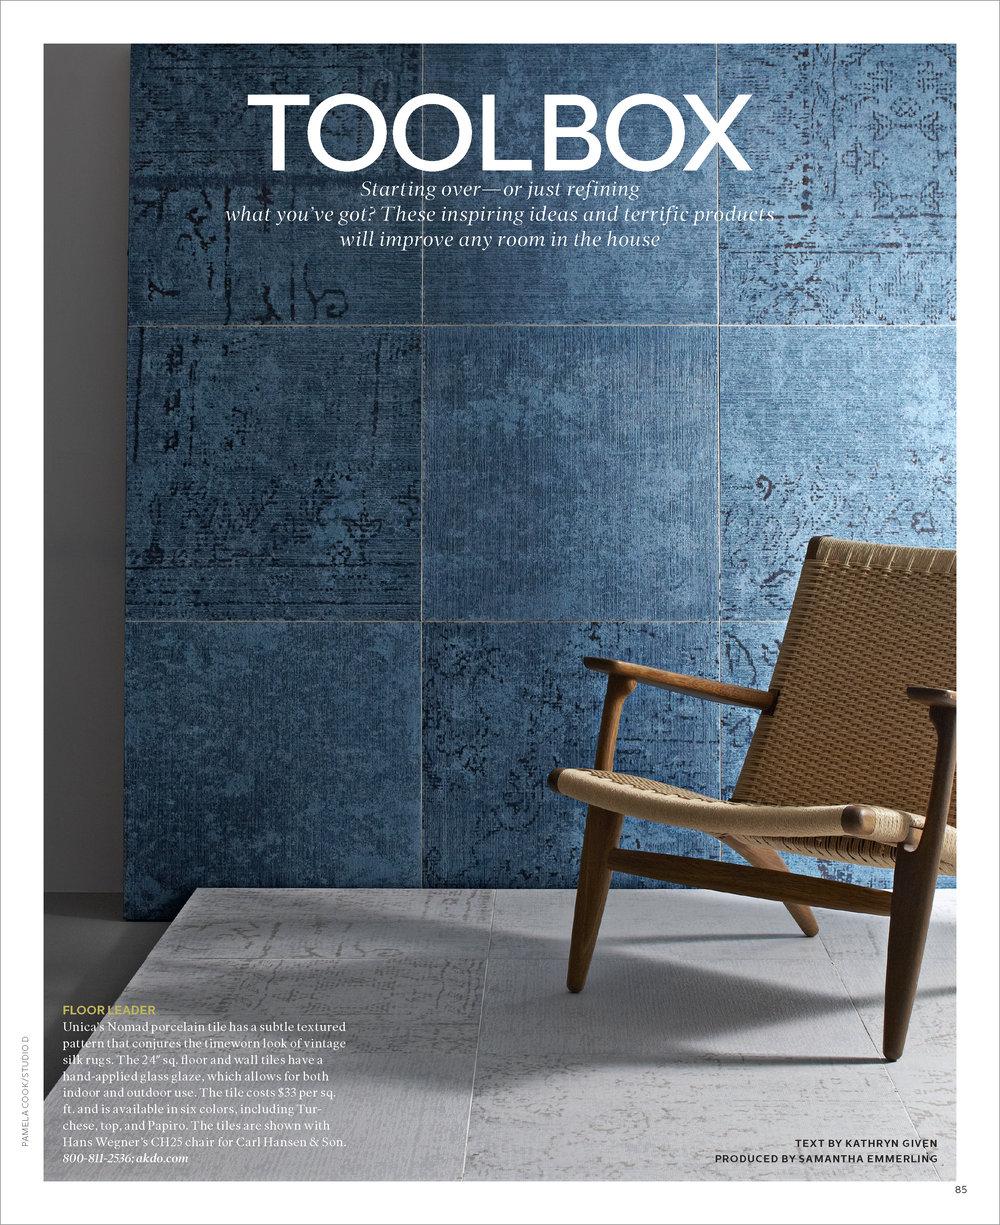 edc1214 toolbox-hi-1 copy.jpg